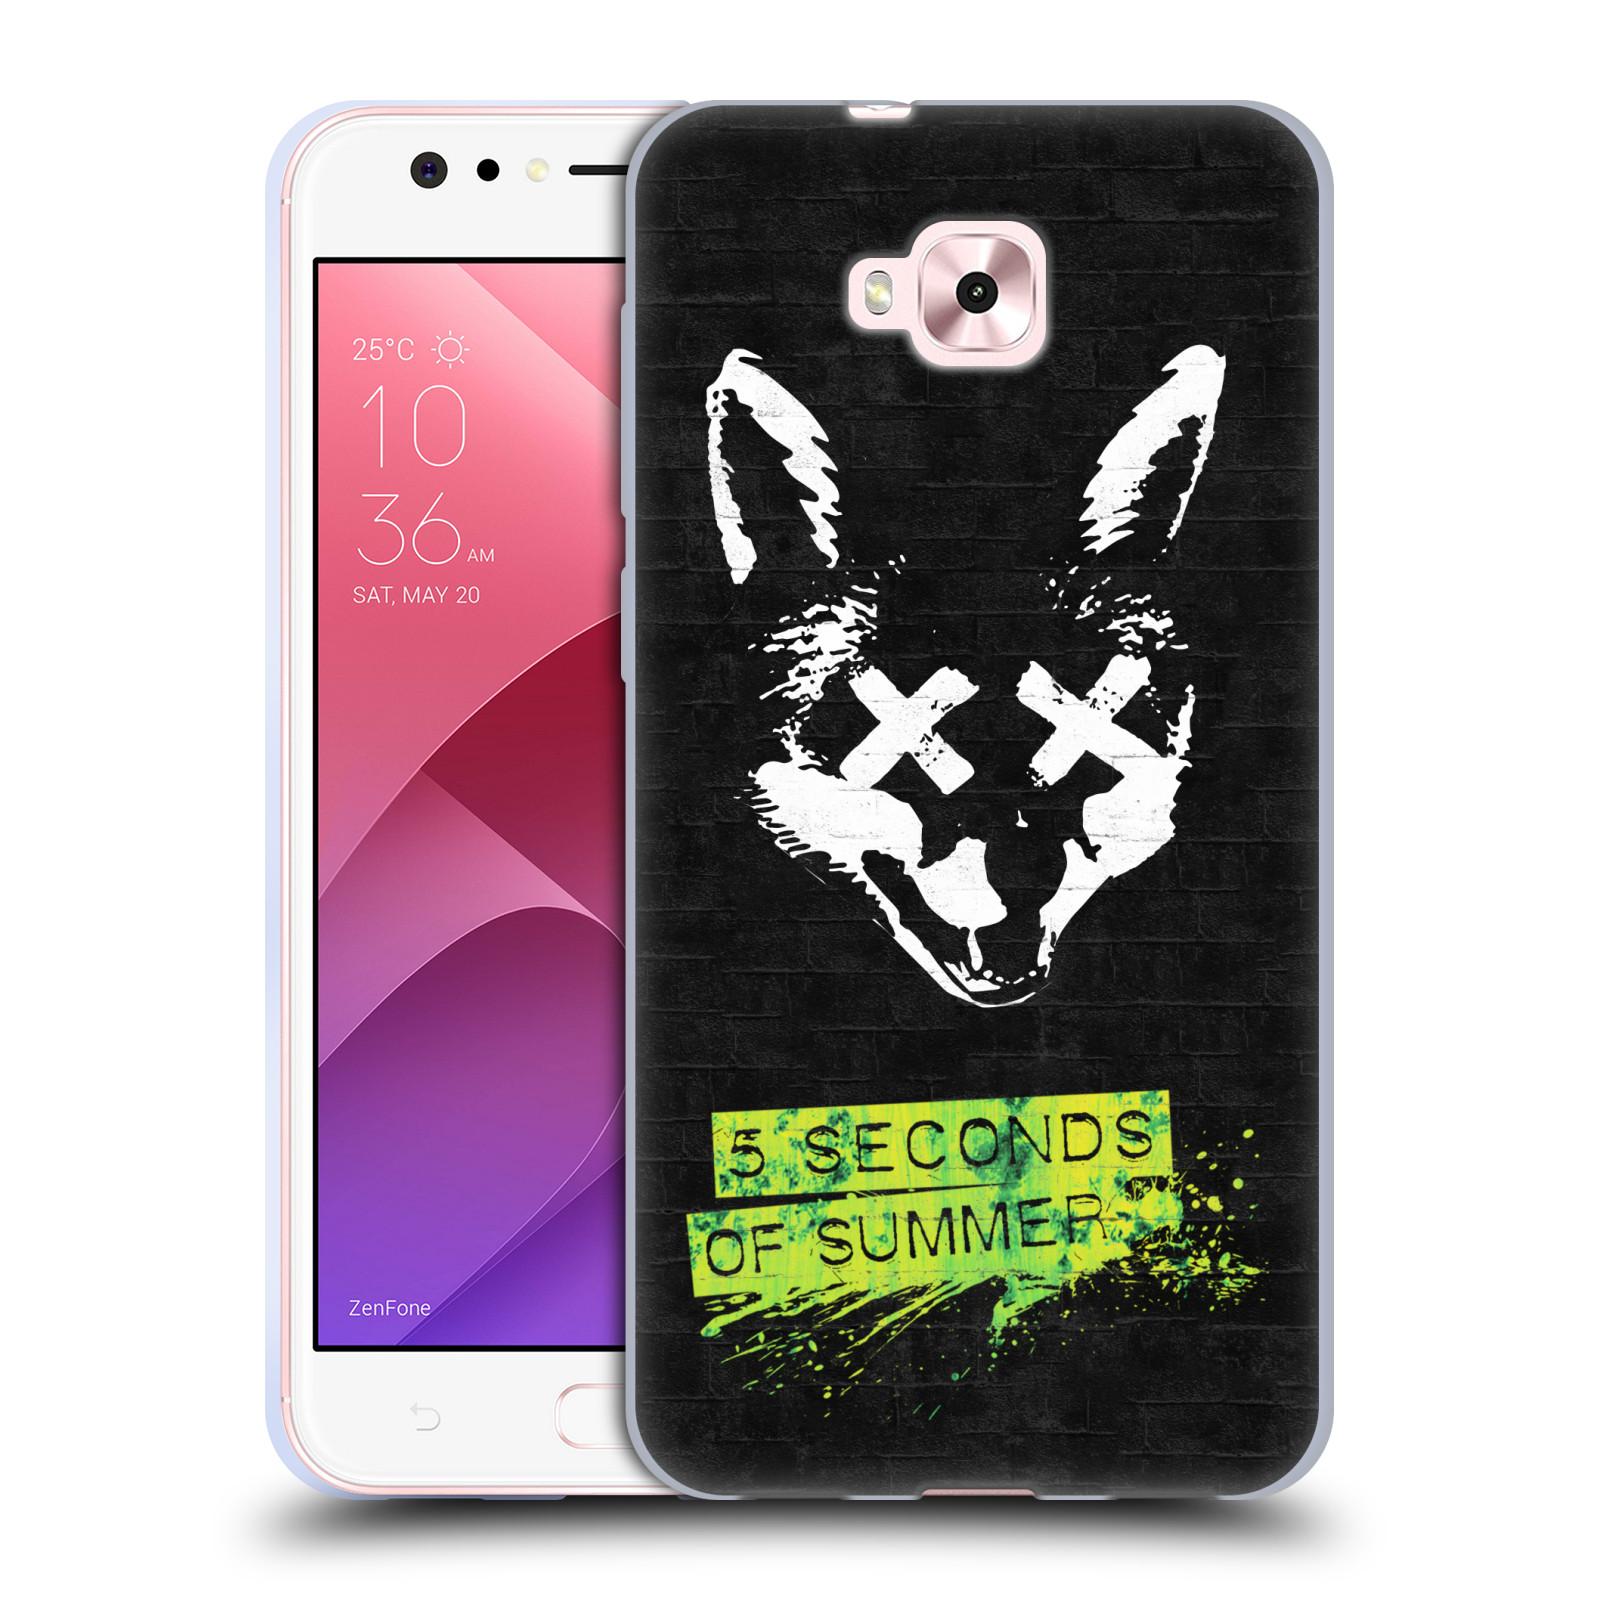 Silikonové pouzdro na mobil Asus Zenfone 4 Selfie ZD553KL - Head Case - 5 Seconds of Summer - Fox